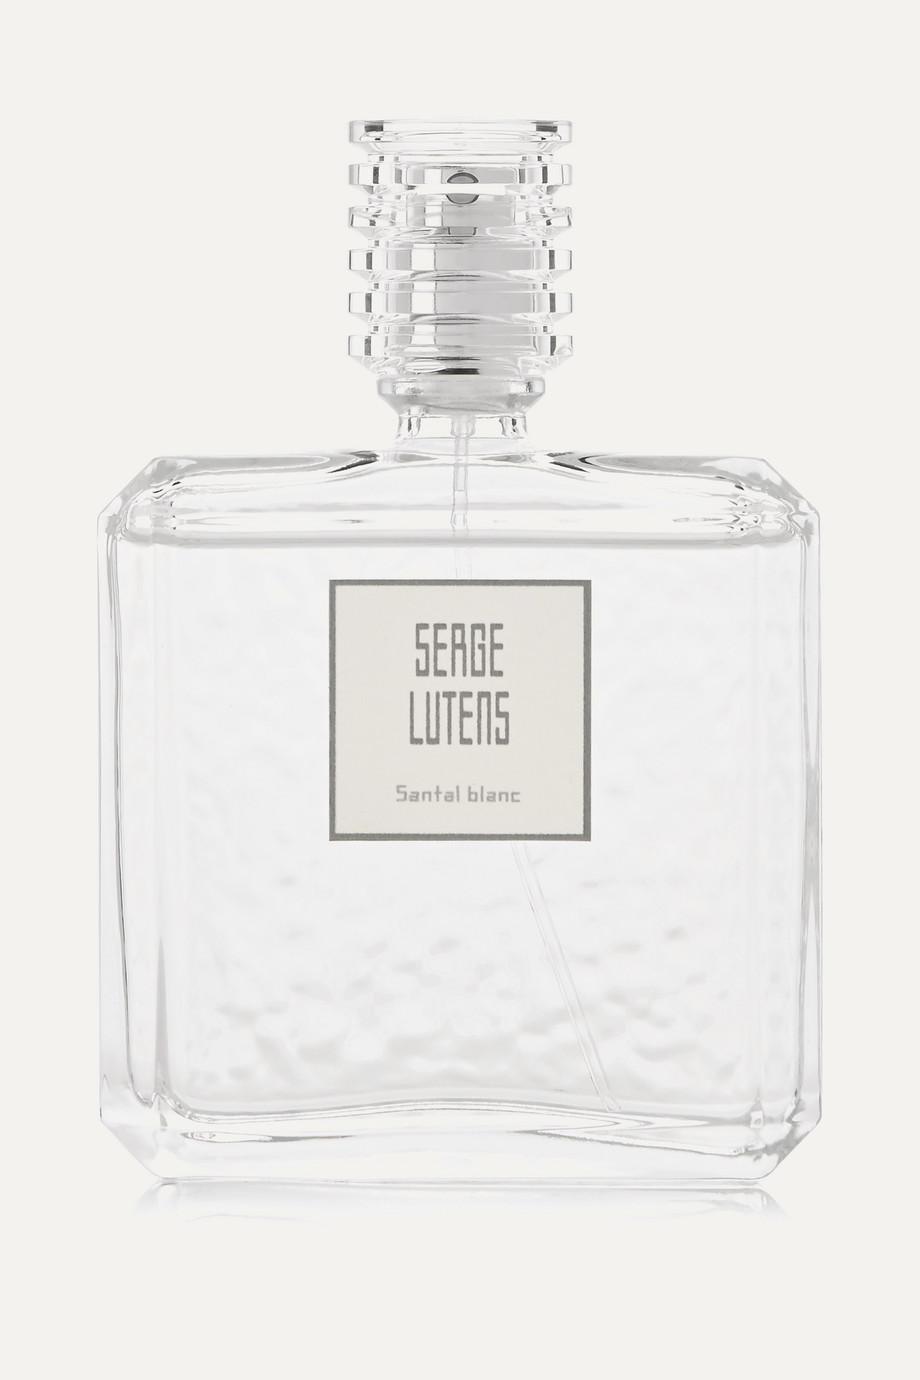 Serge Lutens Santal Blanc, 100 ml – Eau de Parfum